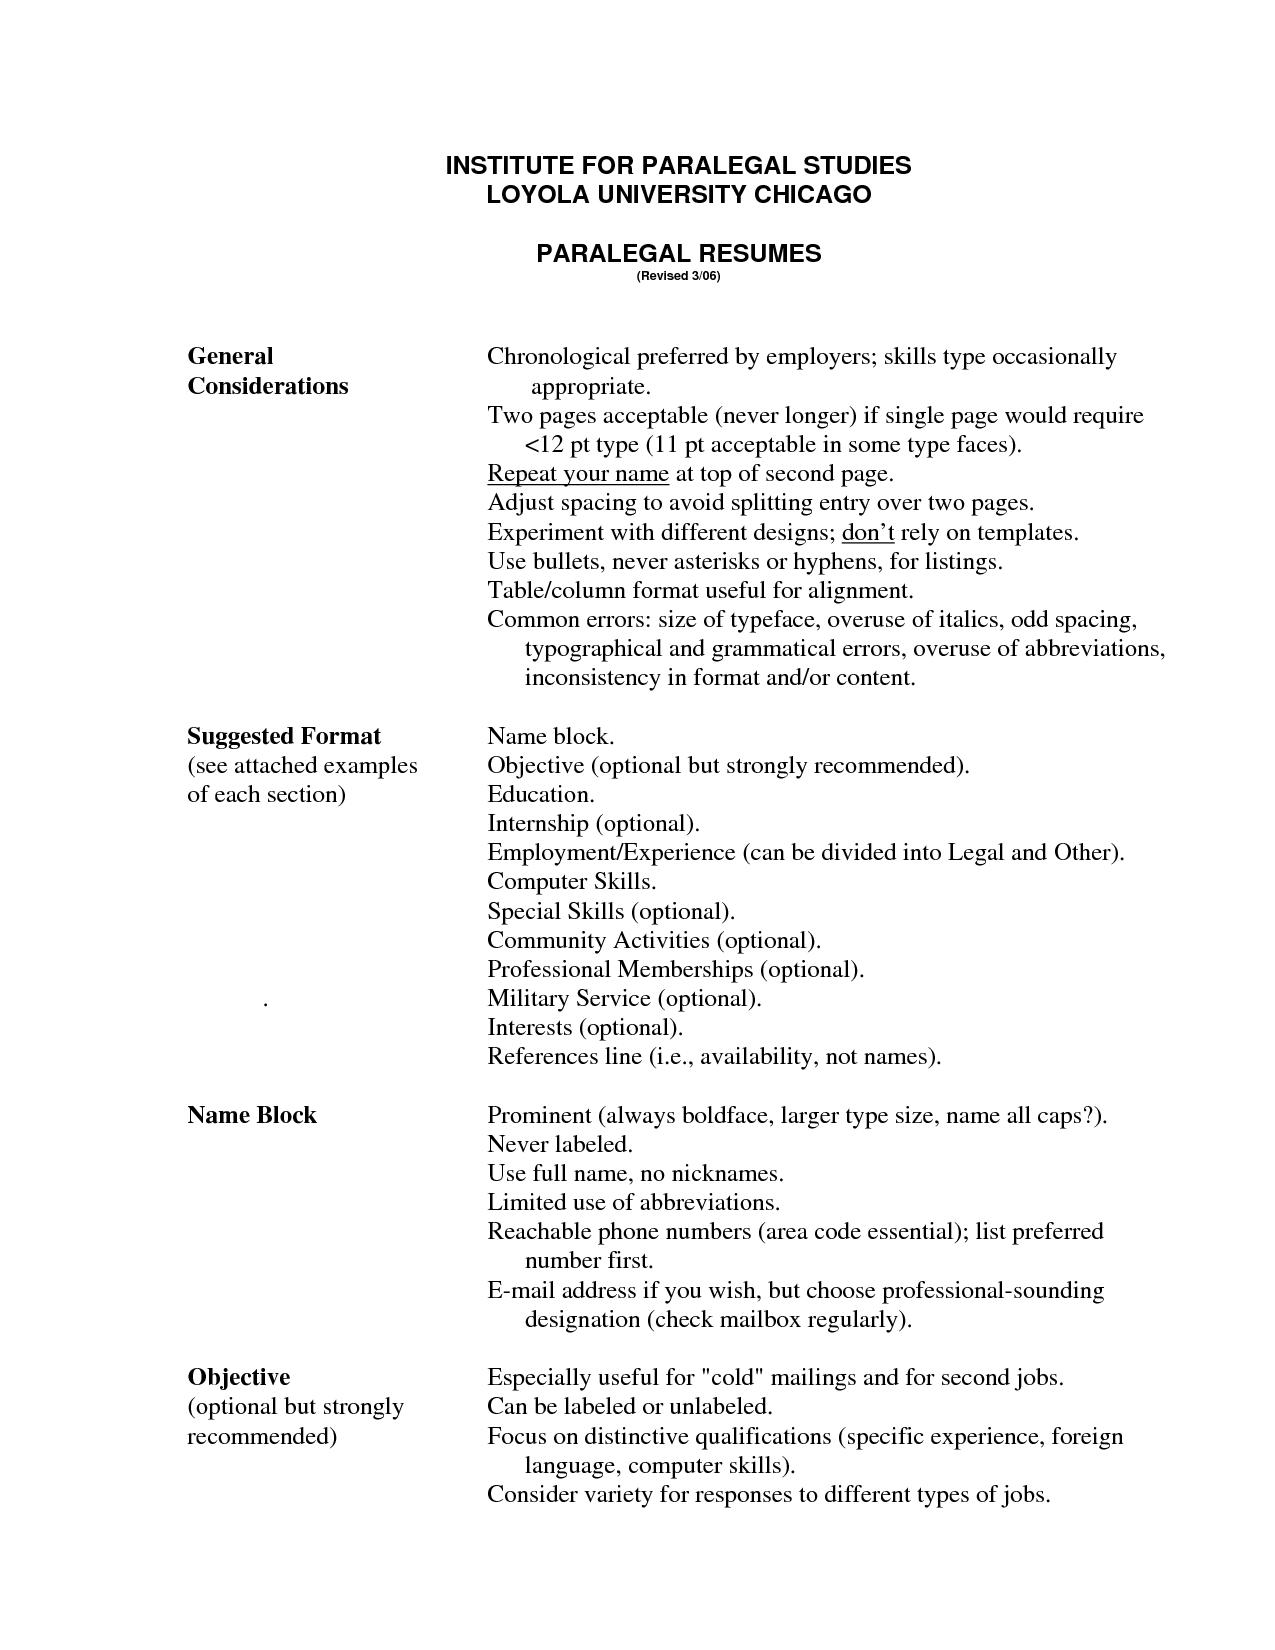 Paralegal Resume Templates - Resume Sample